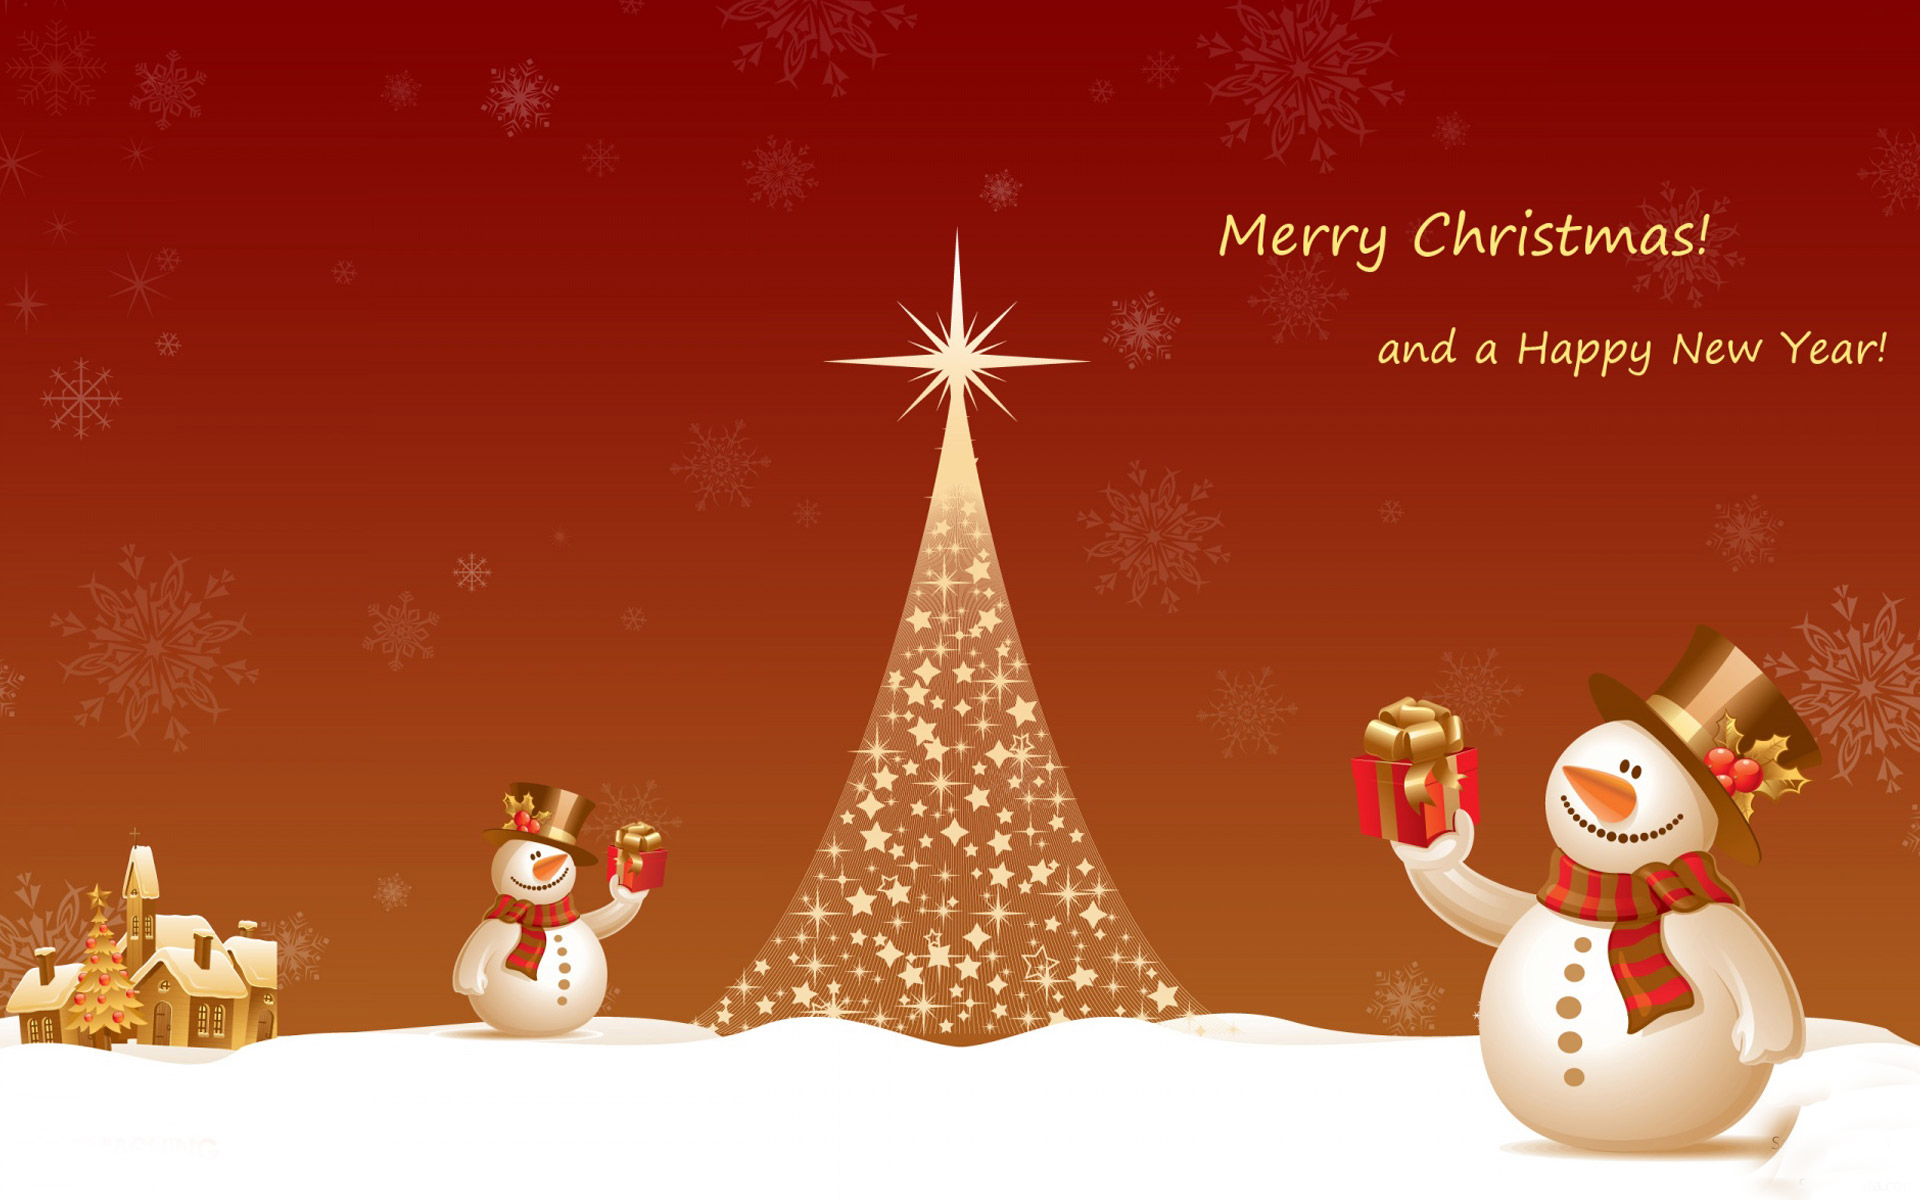 christmas new year wallpaper hd